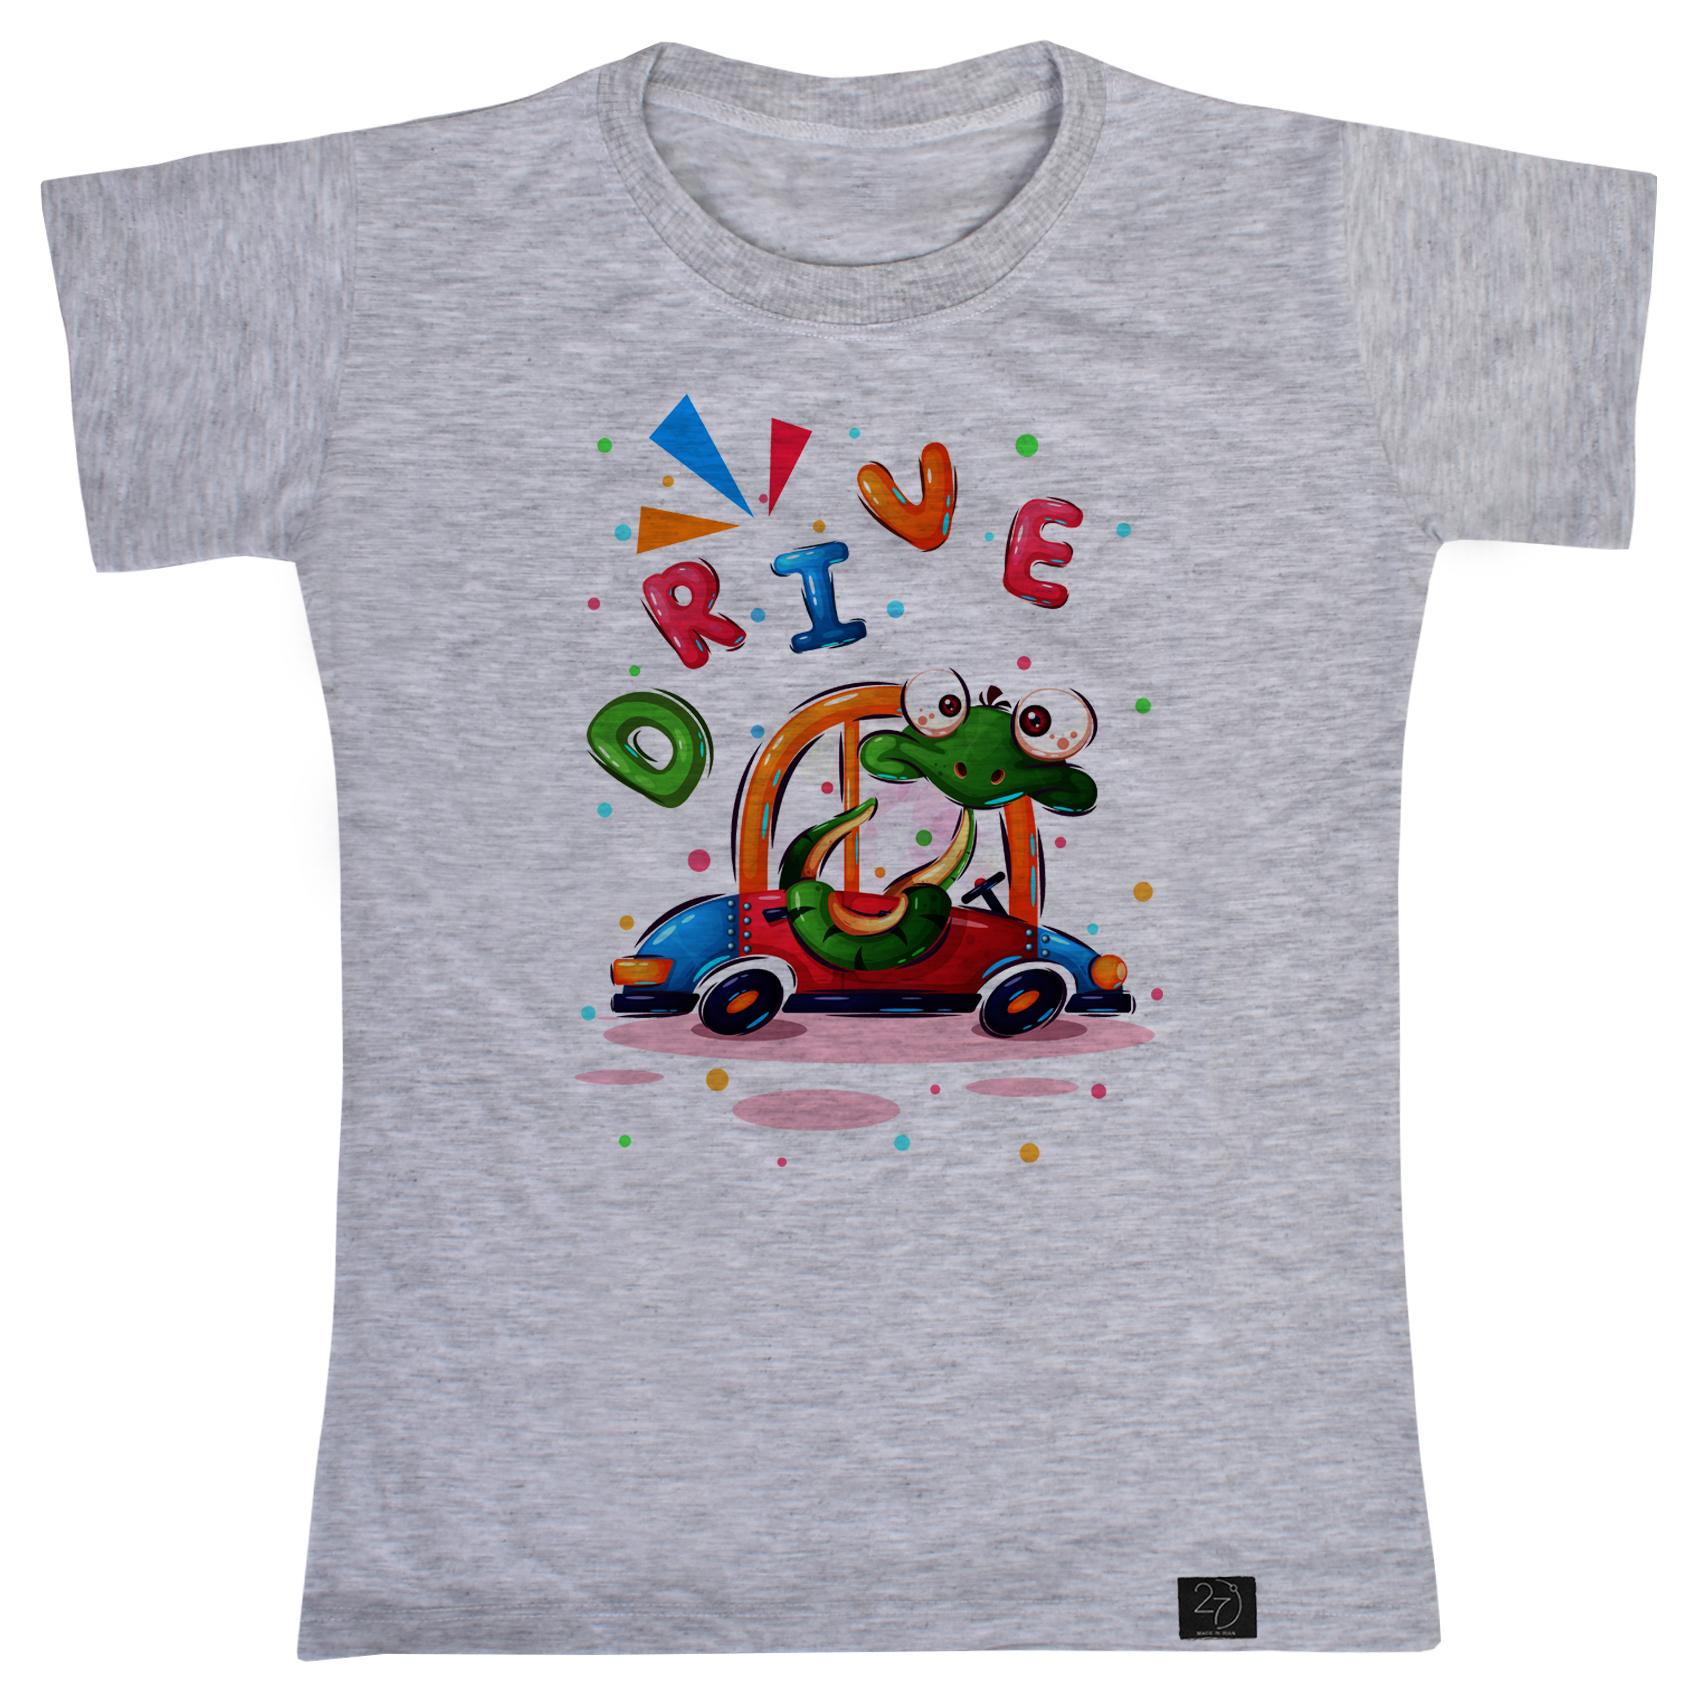 تی شرت پسرانه 27 طرح DRIVE کد J15